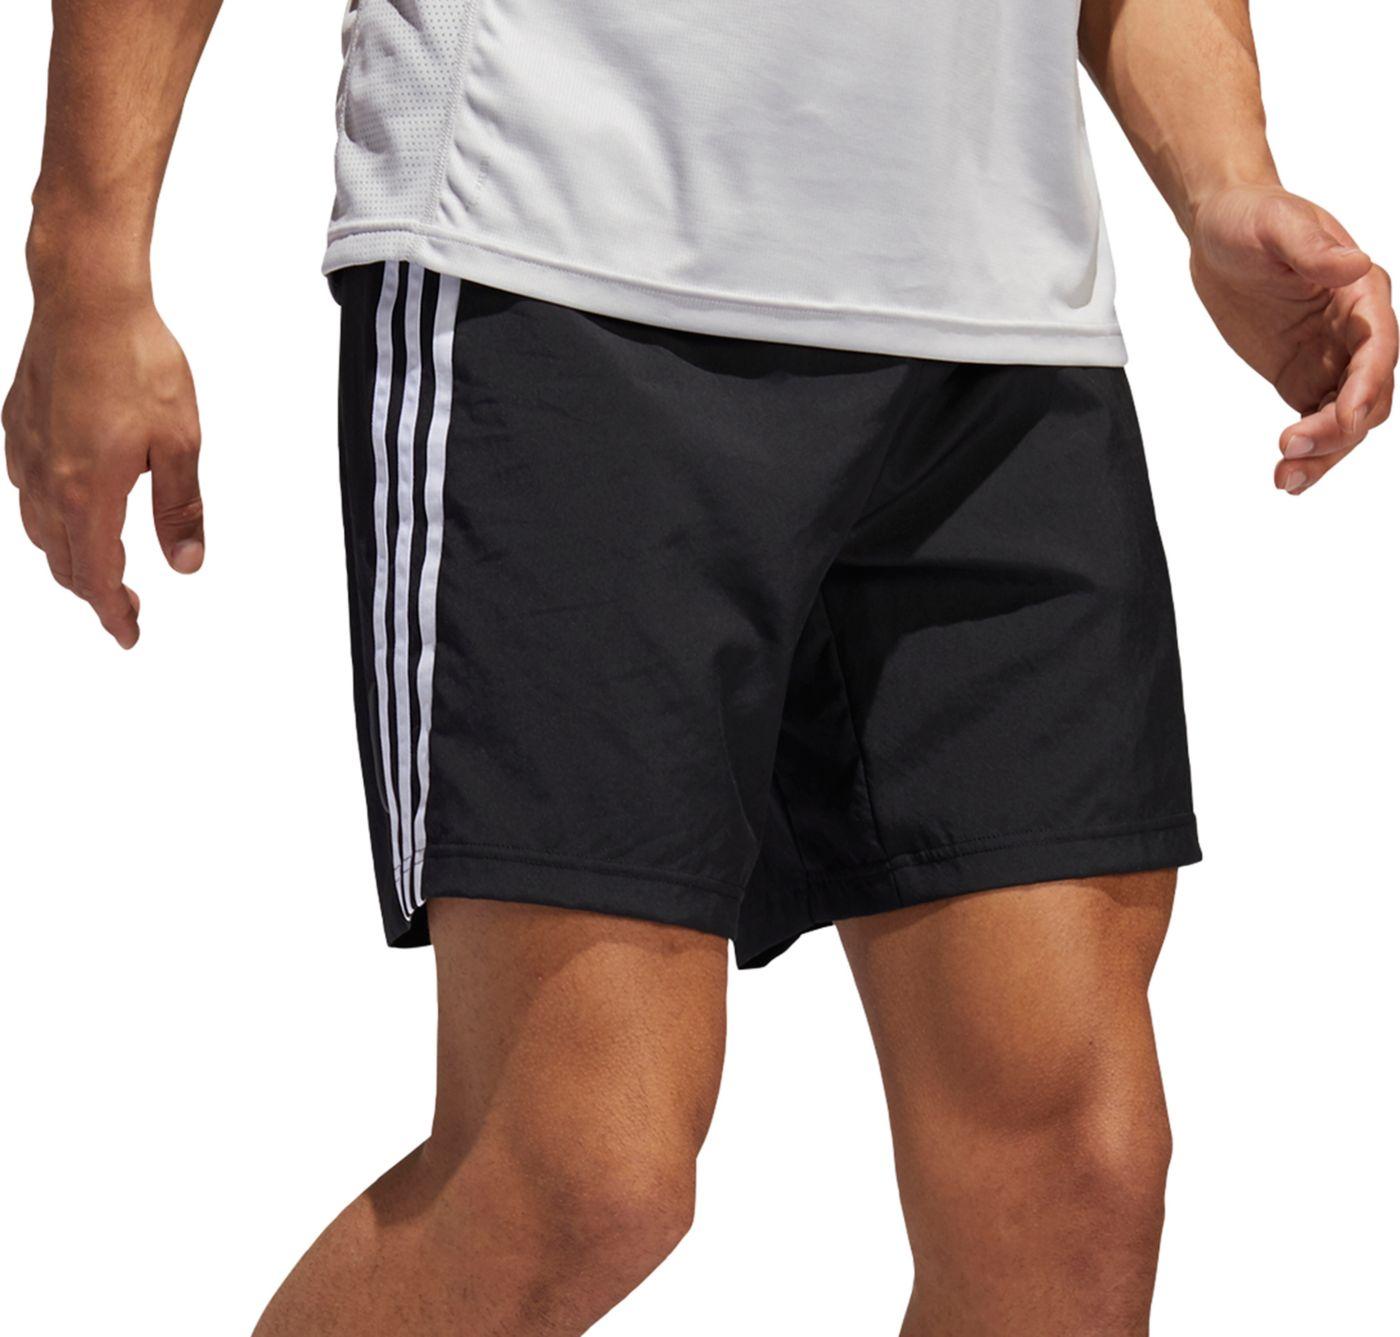 adidas Men's Run It 3-Stripes 9'' Shorts